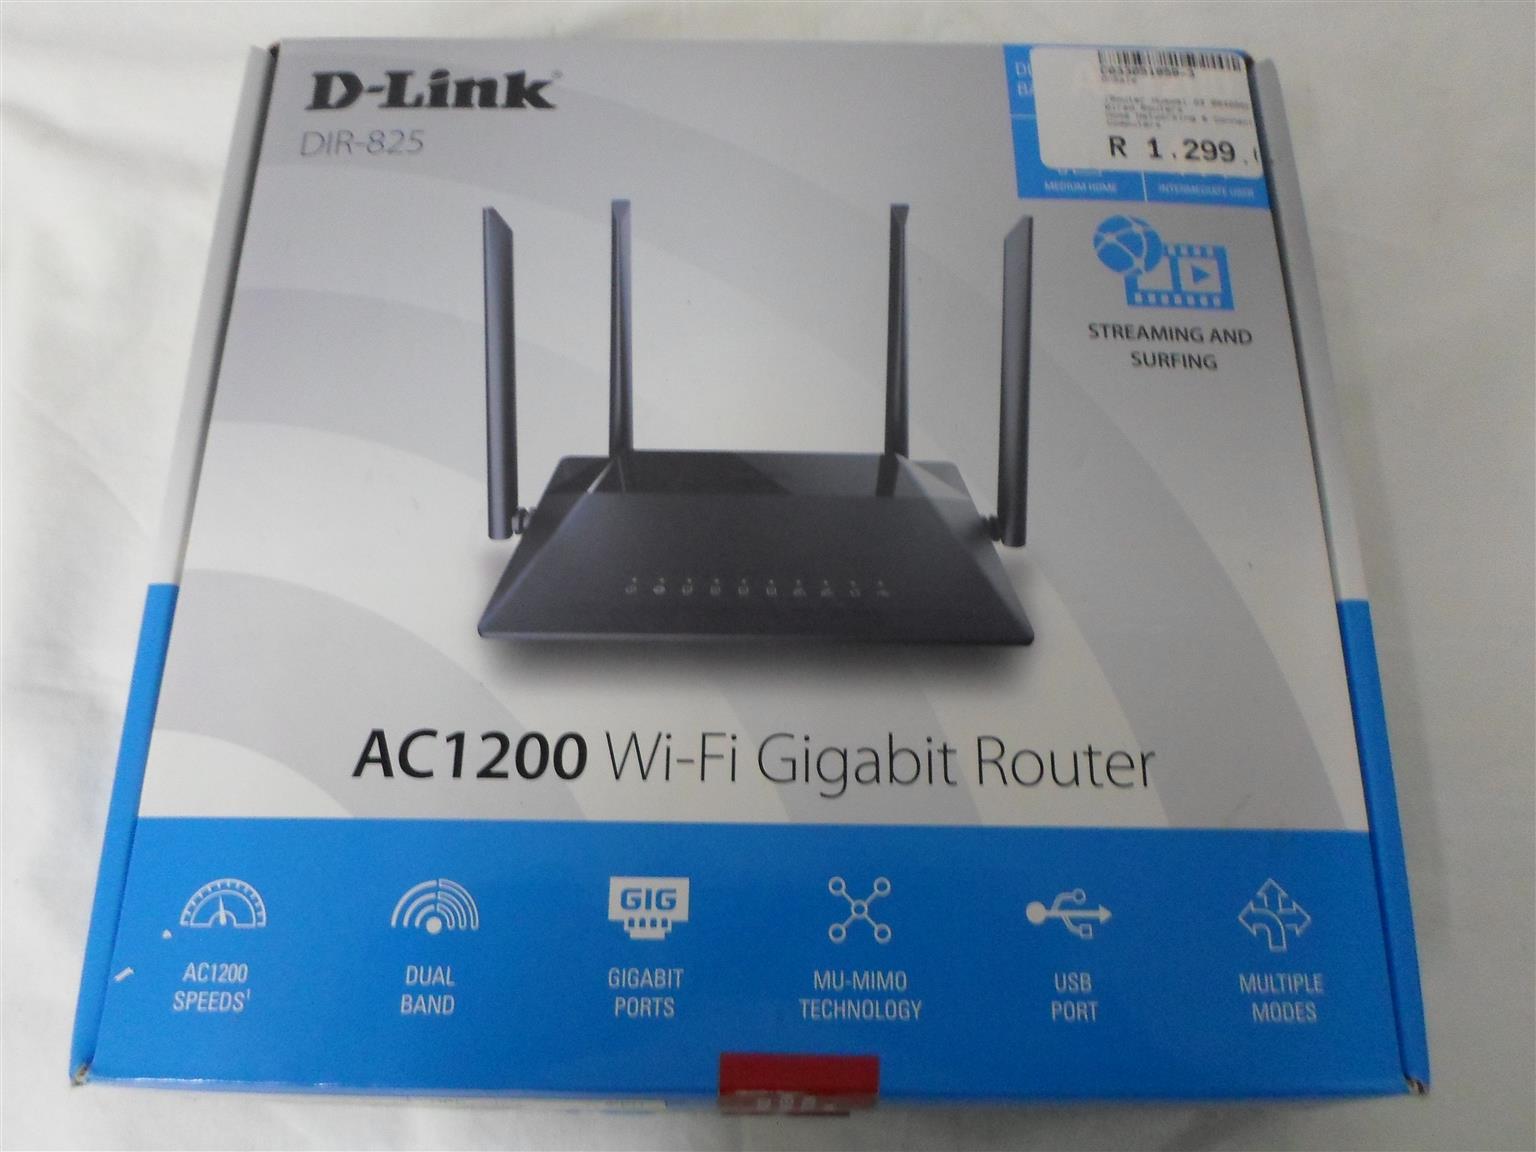 D-Link AC1200 WiFi Gigabit Router